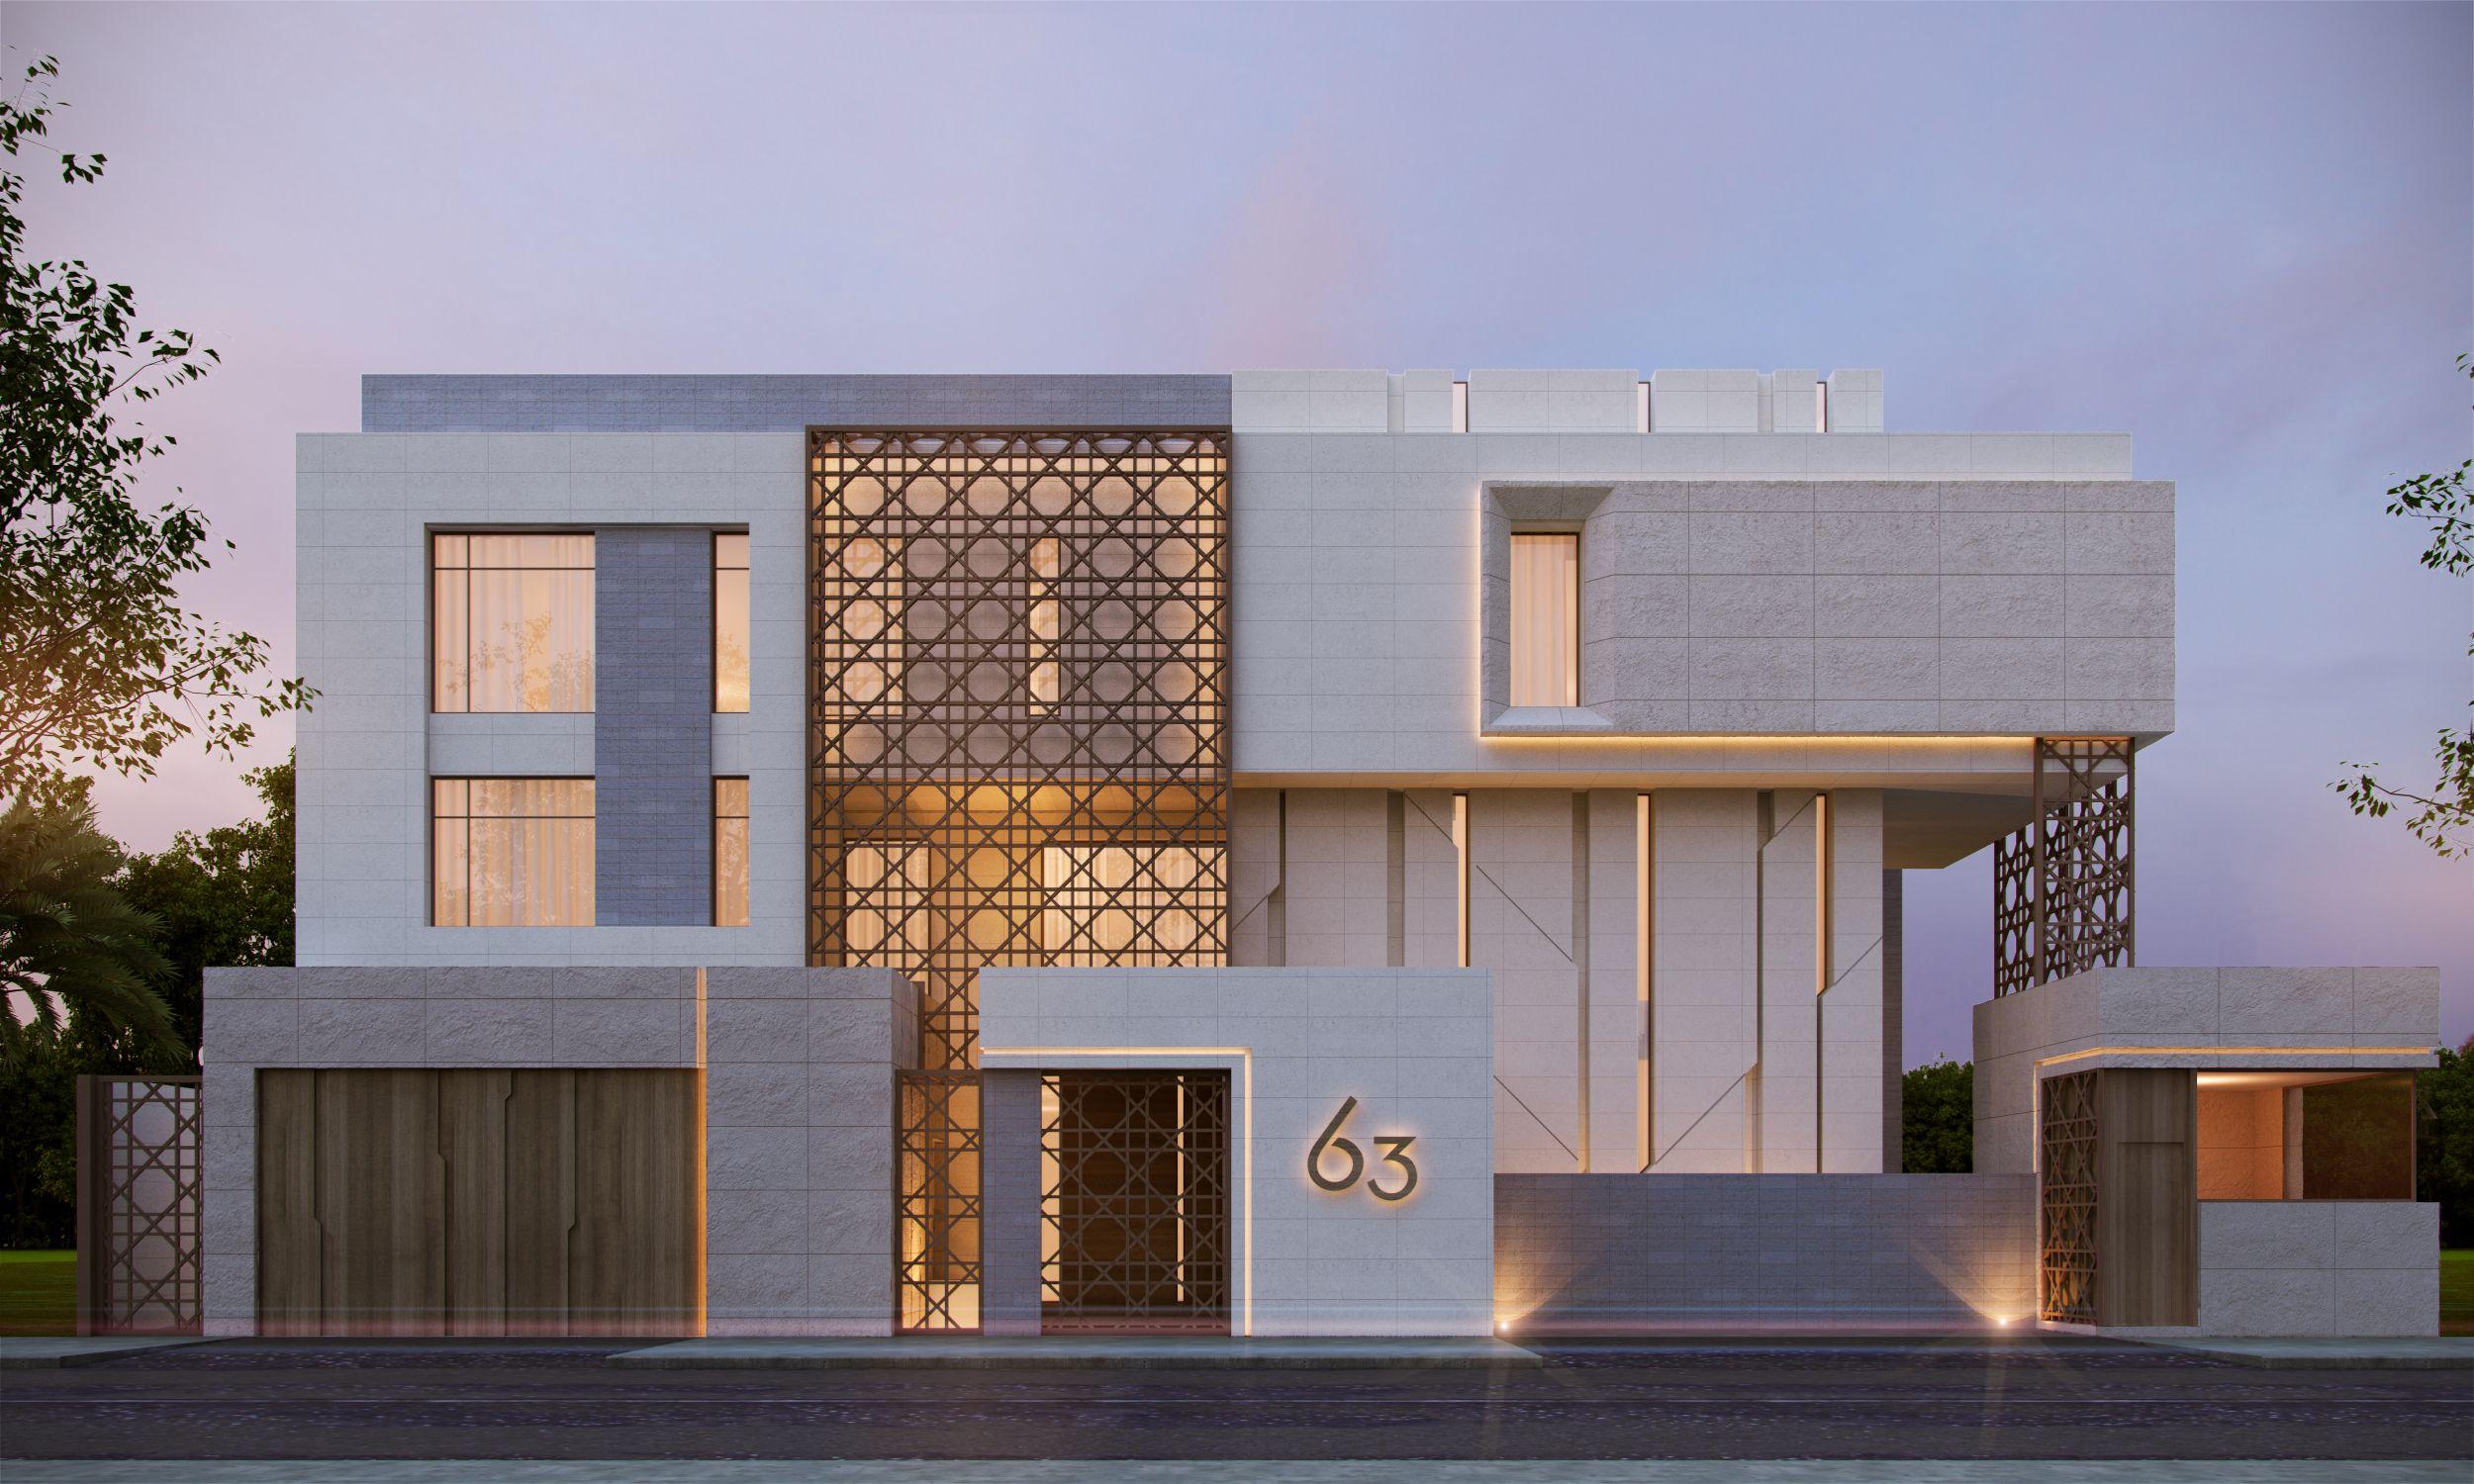 880 m private villa kuwait sarah sadeq architects sarah sadeq architectes in 2018 pinterest. Black Bedroom Furniture Sets. Home Design Ideas